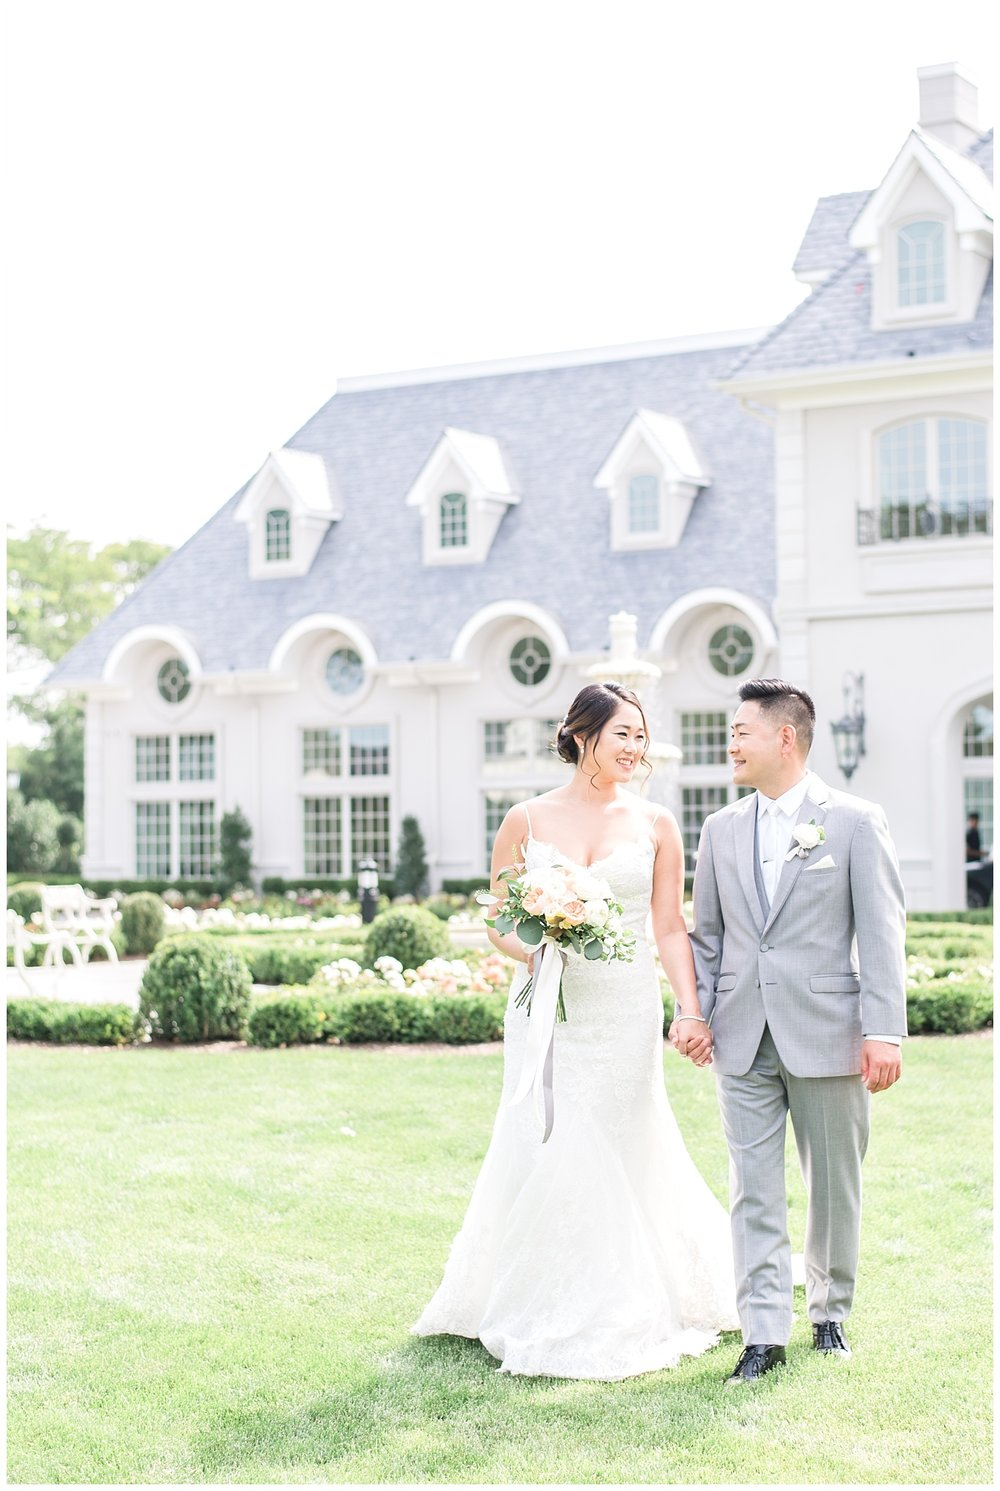 park-chateau-wedding-fabiana-skubic-photography (32).jpg